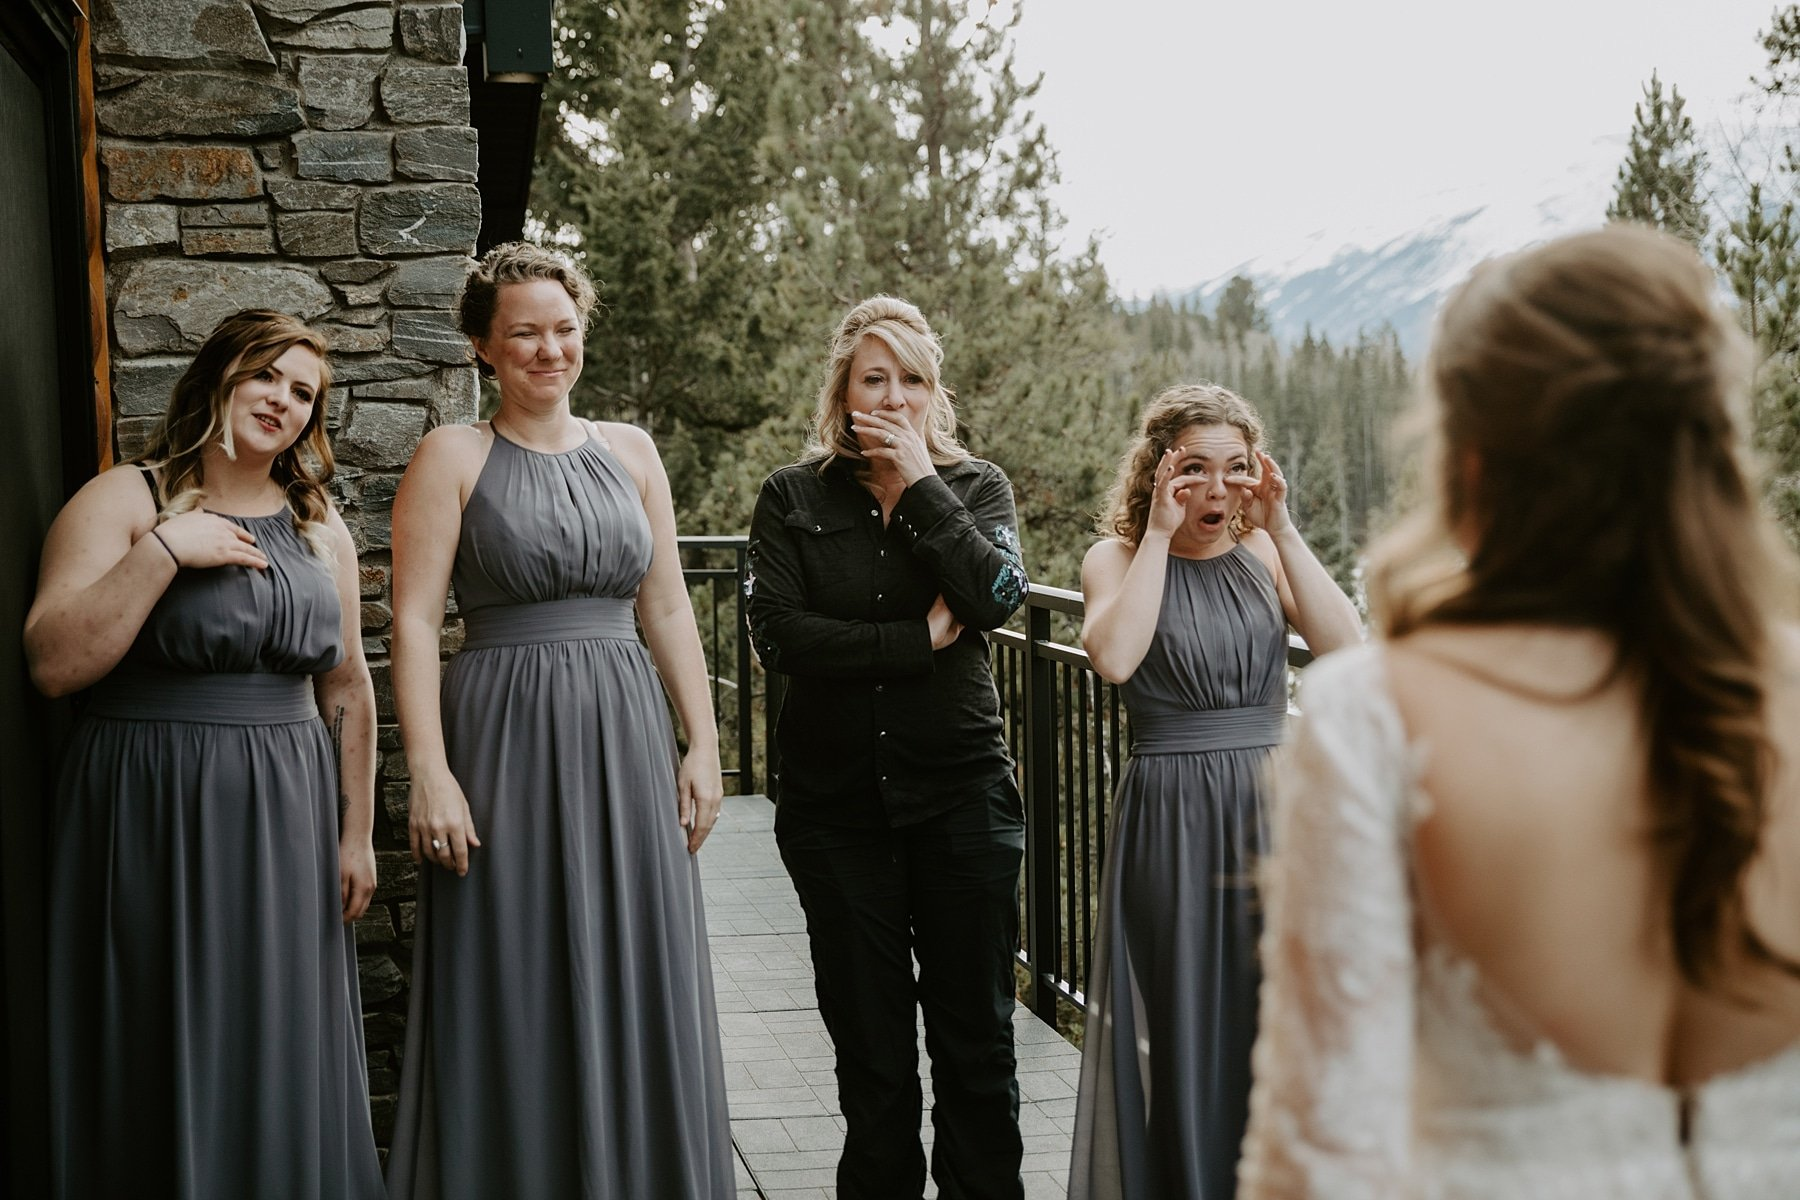 Pyramid Lake Resort Wedding first look with bridesmaids